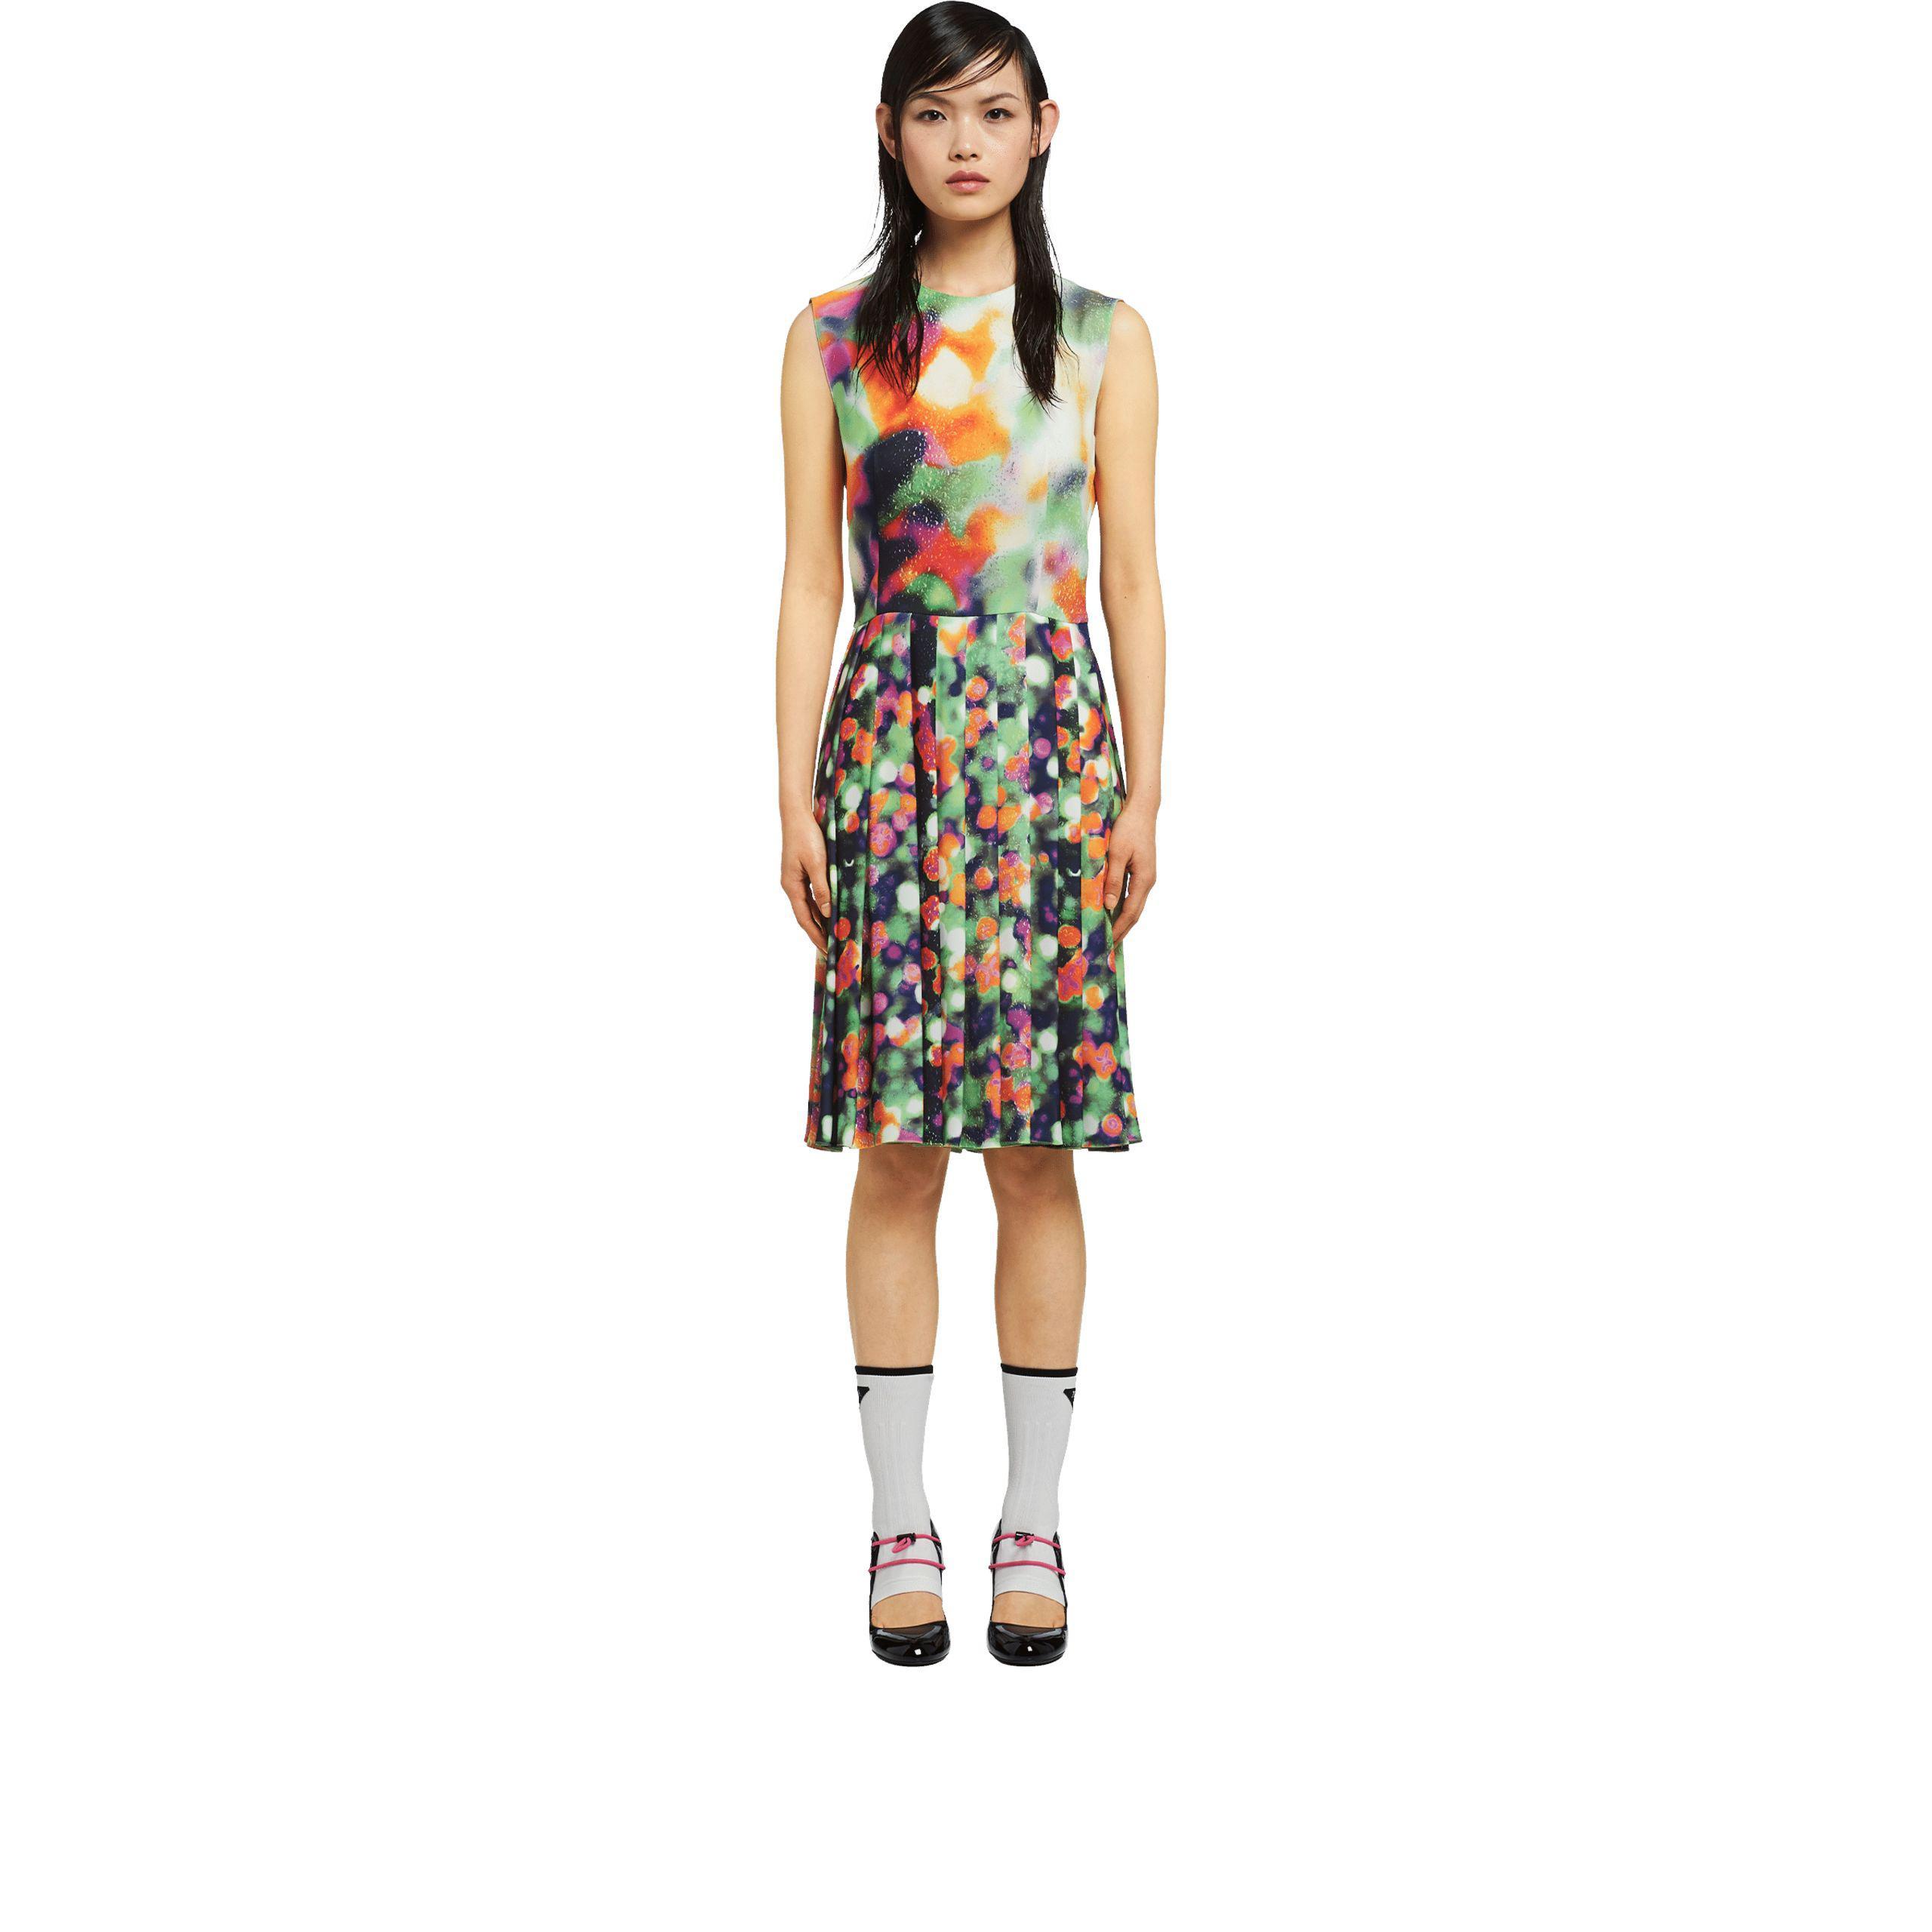 b3f563d4fd7d9 Prada - Multicolor Colored Broadcloth Dress - Lyst